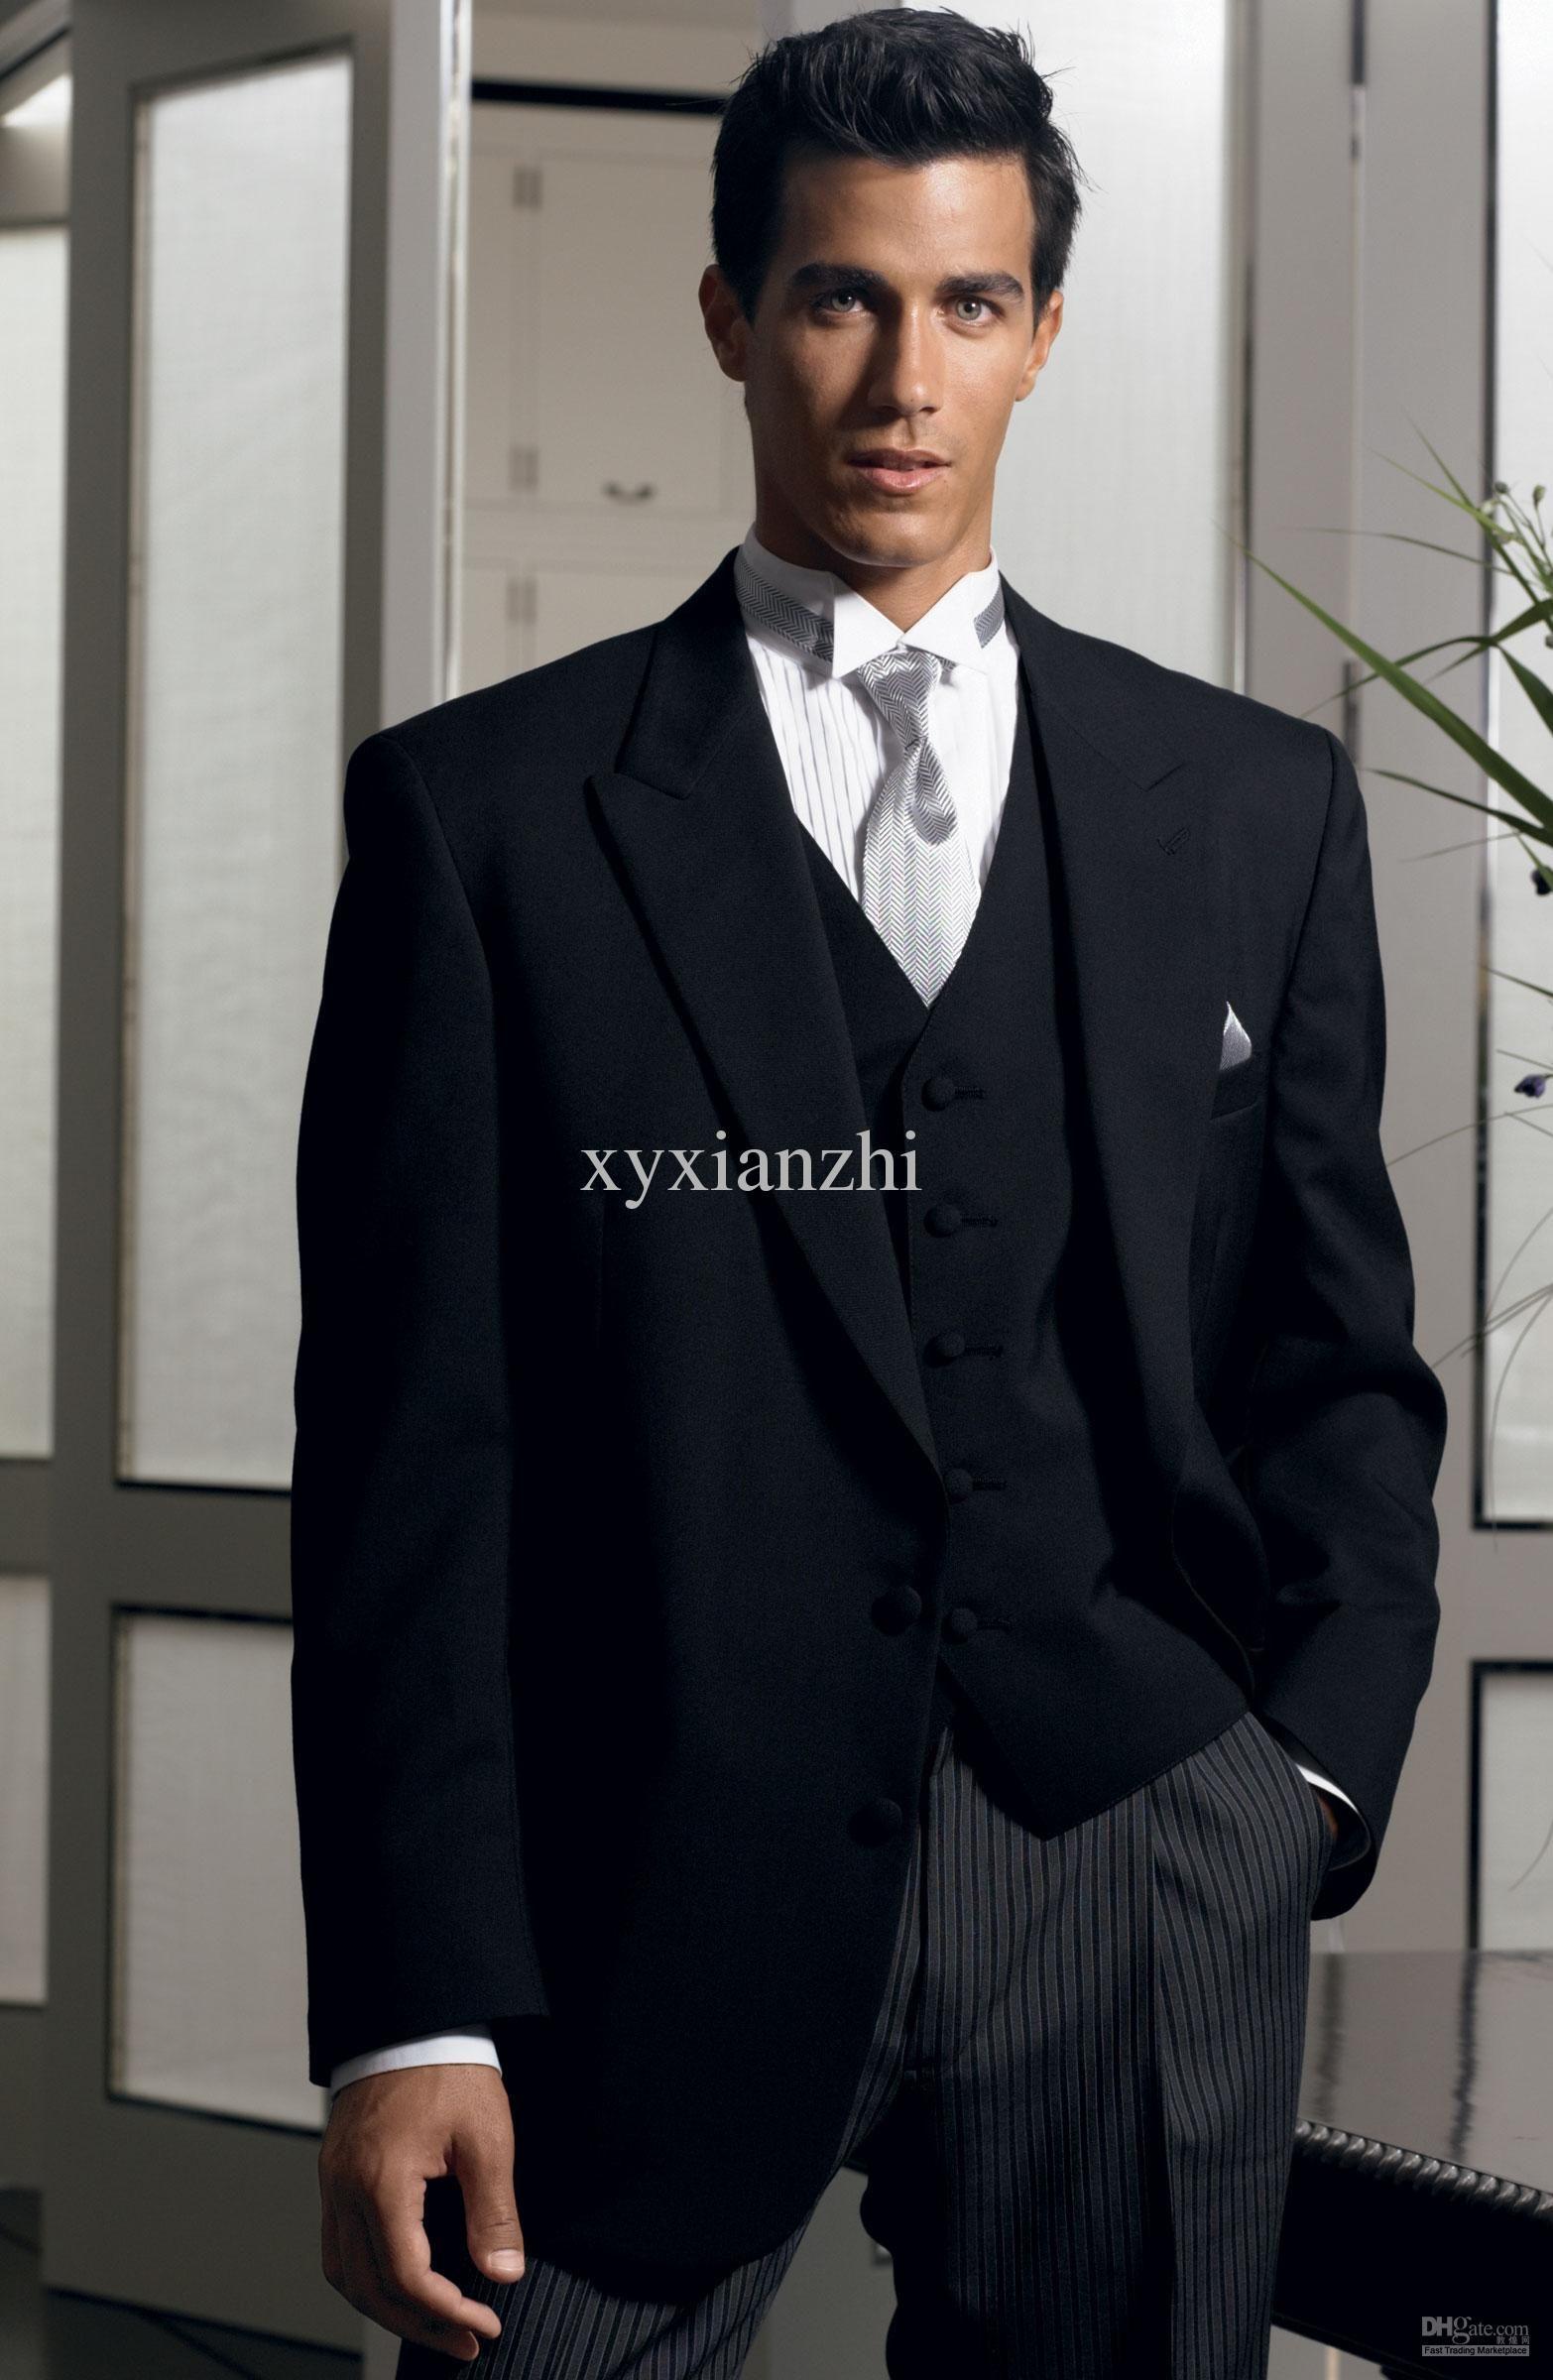 groom-wear-2013-wedding-suits-custom-made.jpg (1566×2400 ...